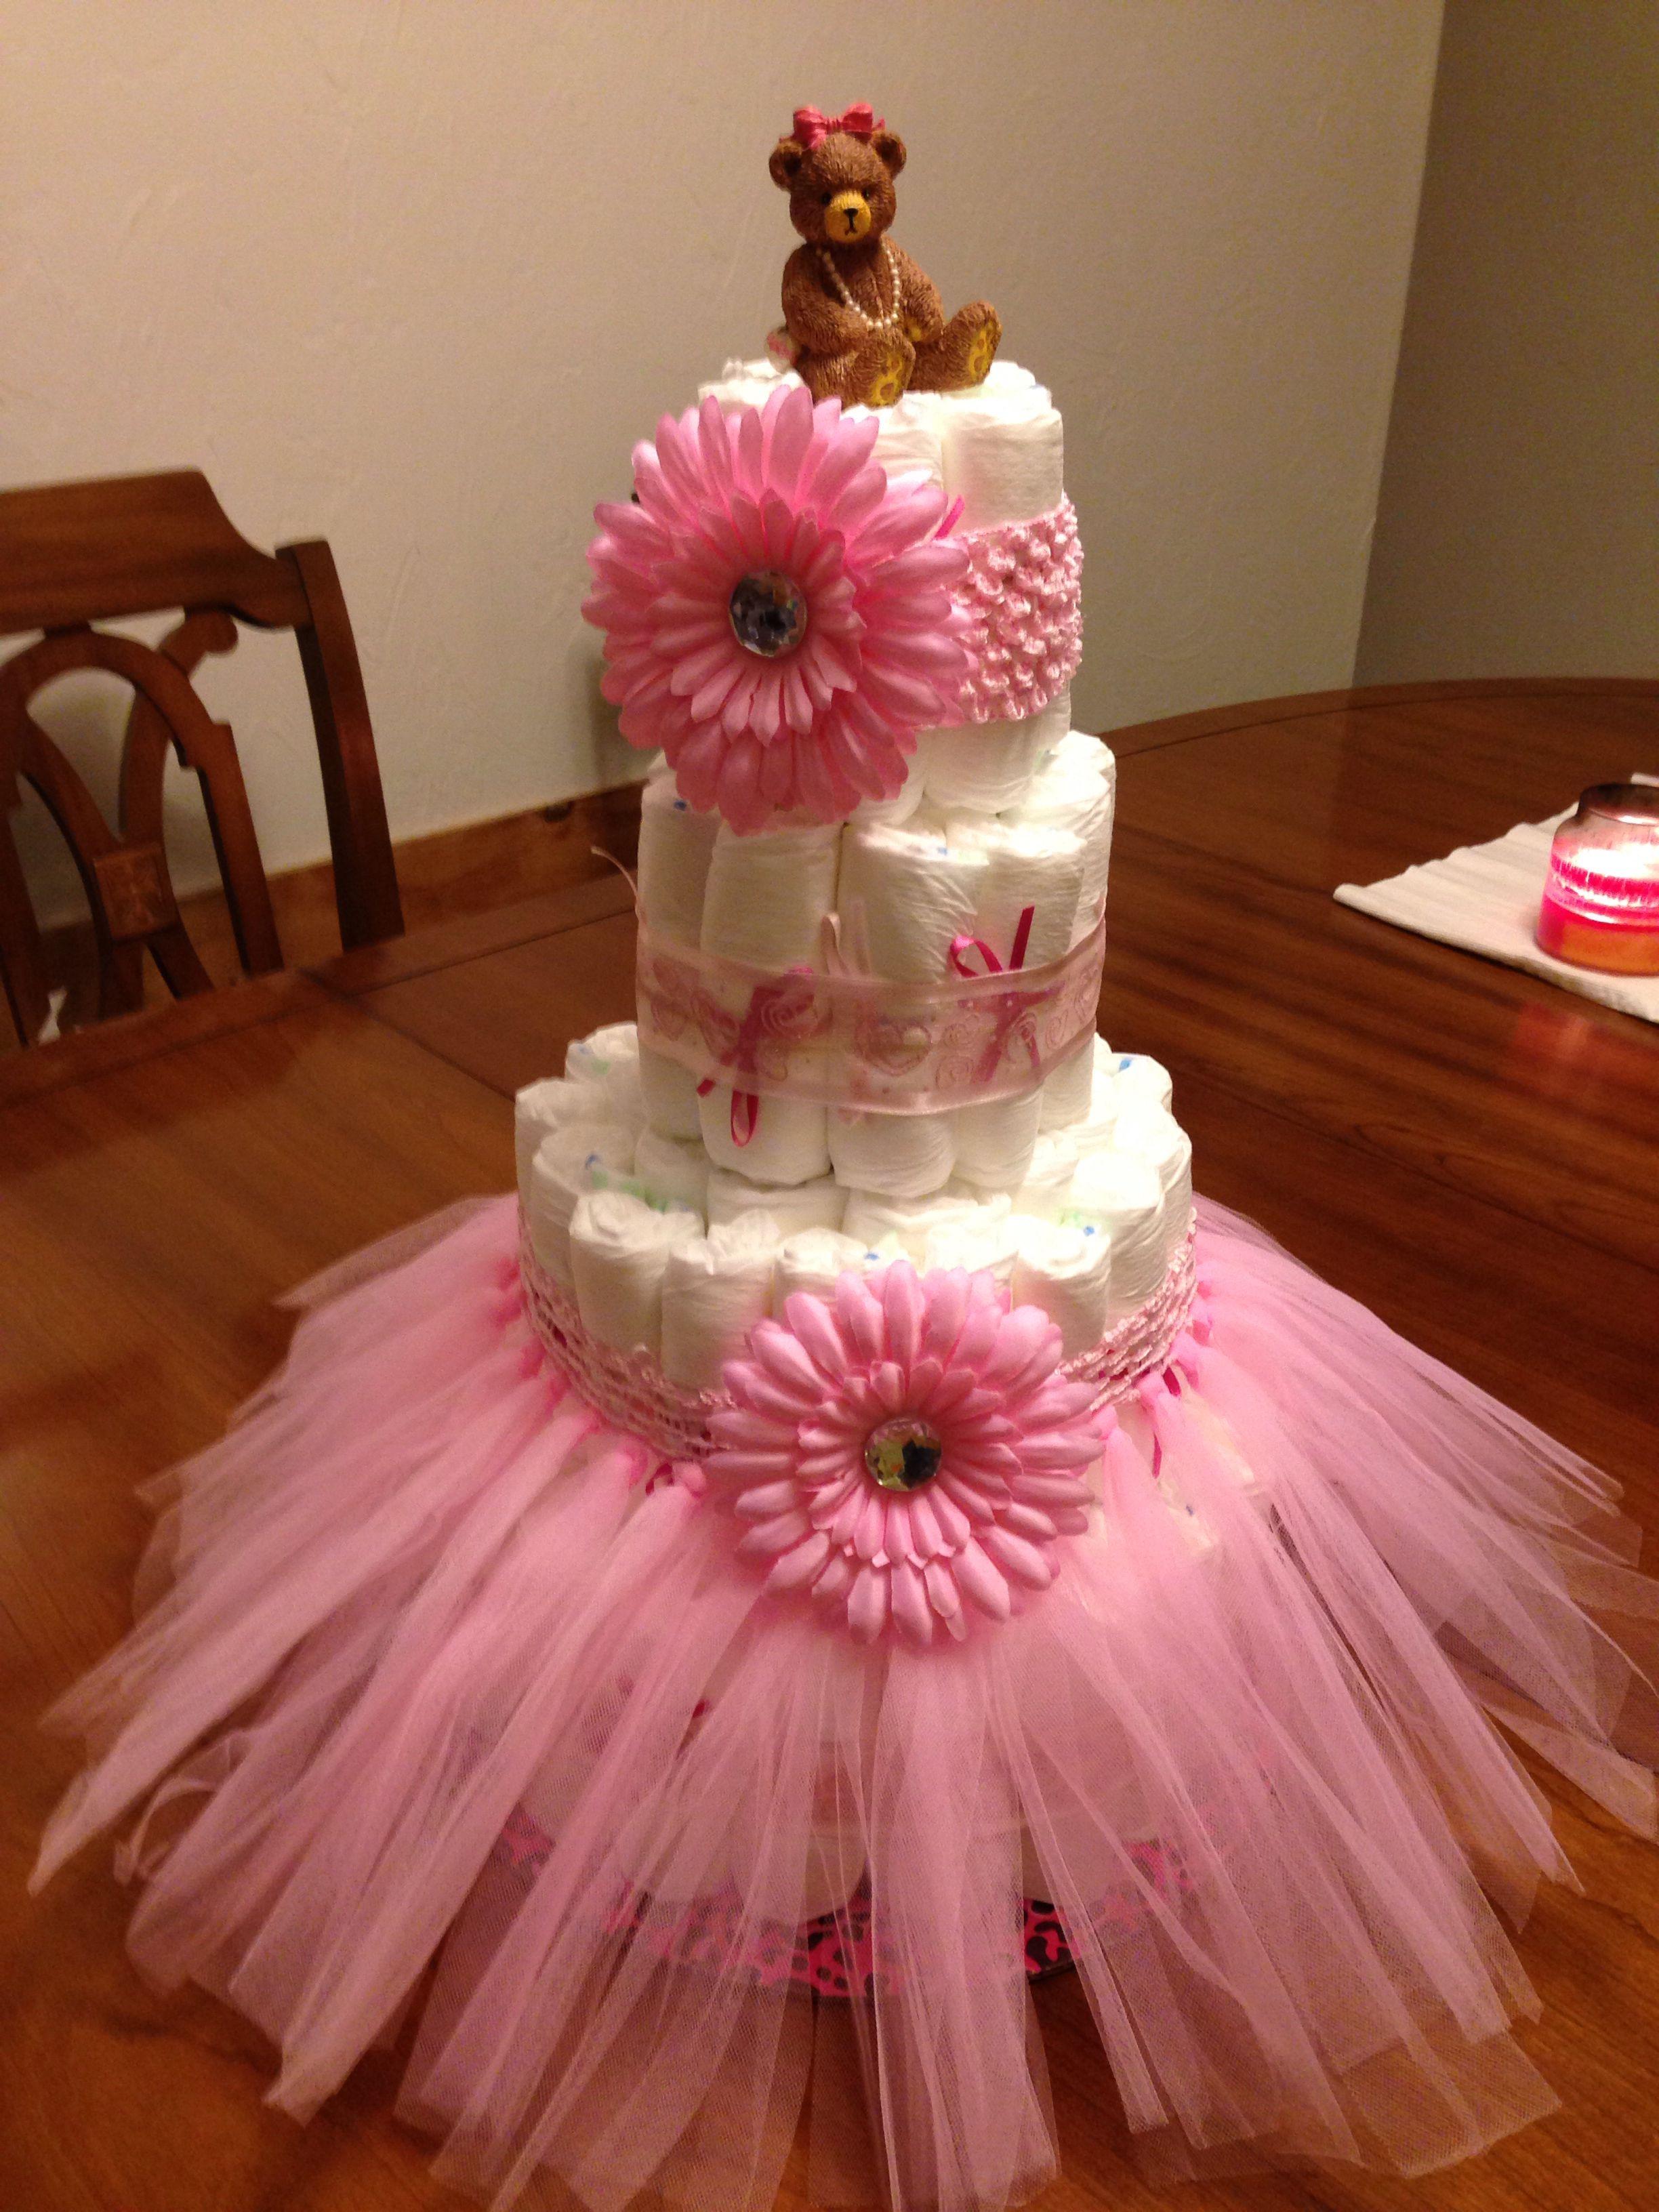 Baby Shower Diaper Cake Using Hobby Lobby Kit And A Little Imagination Baby Shower Diaper Cake Baby Shower Diapers Girl Shower